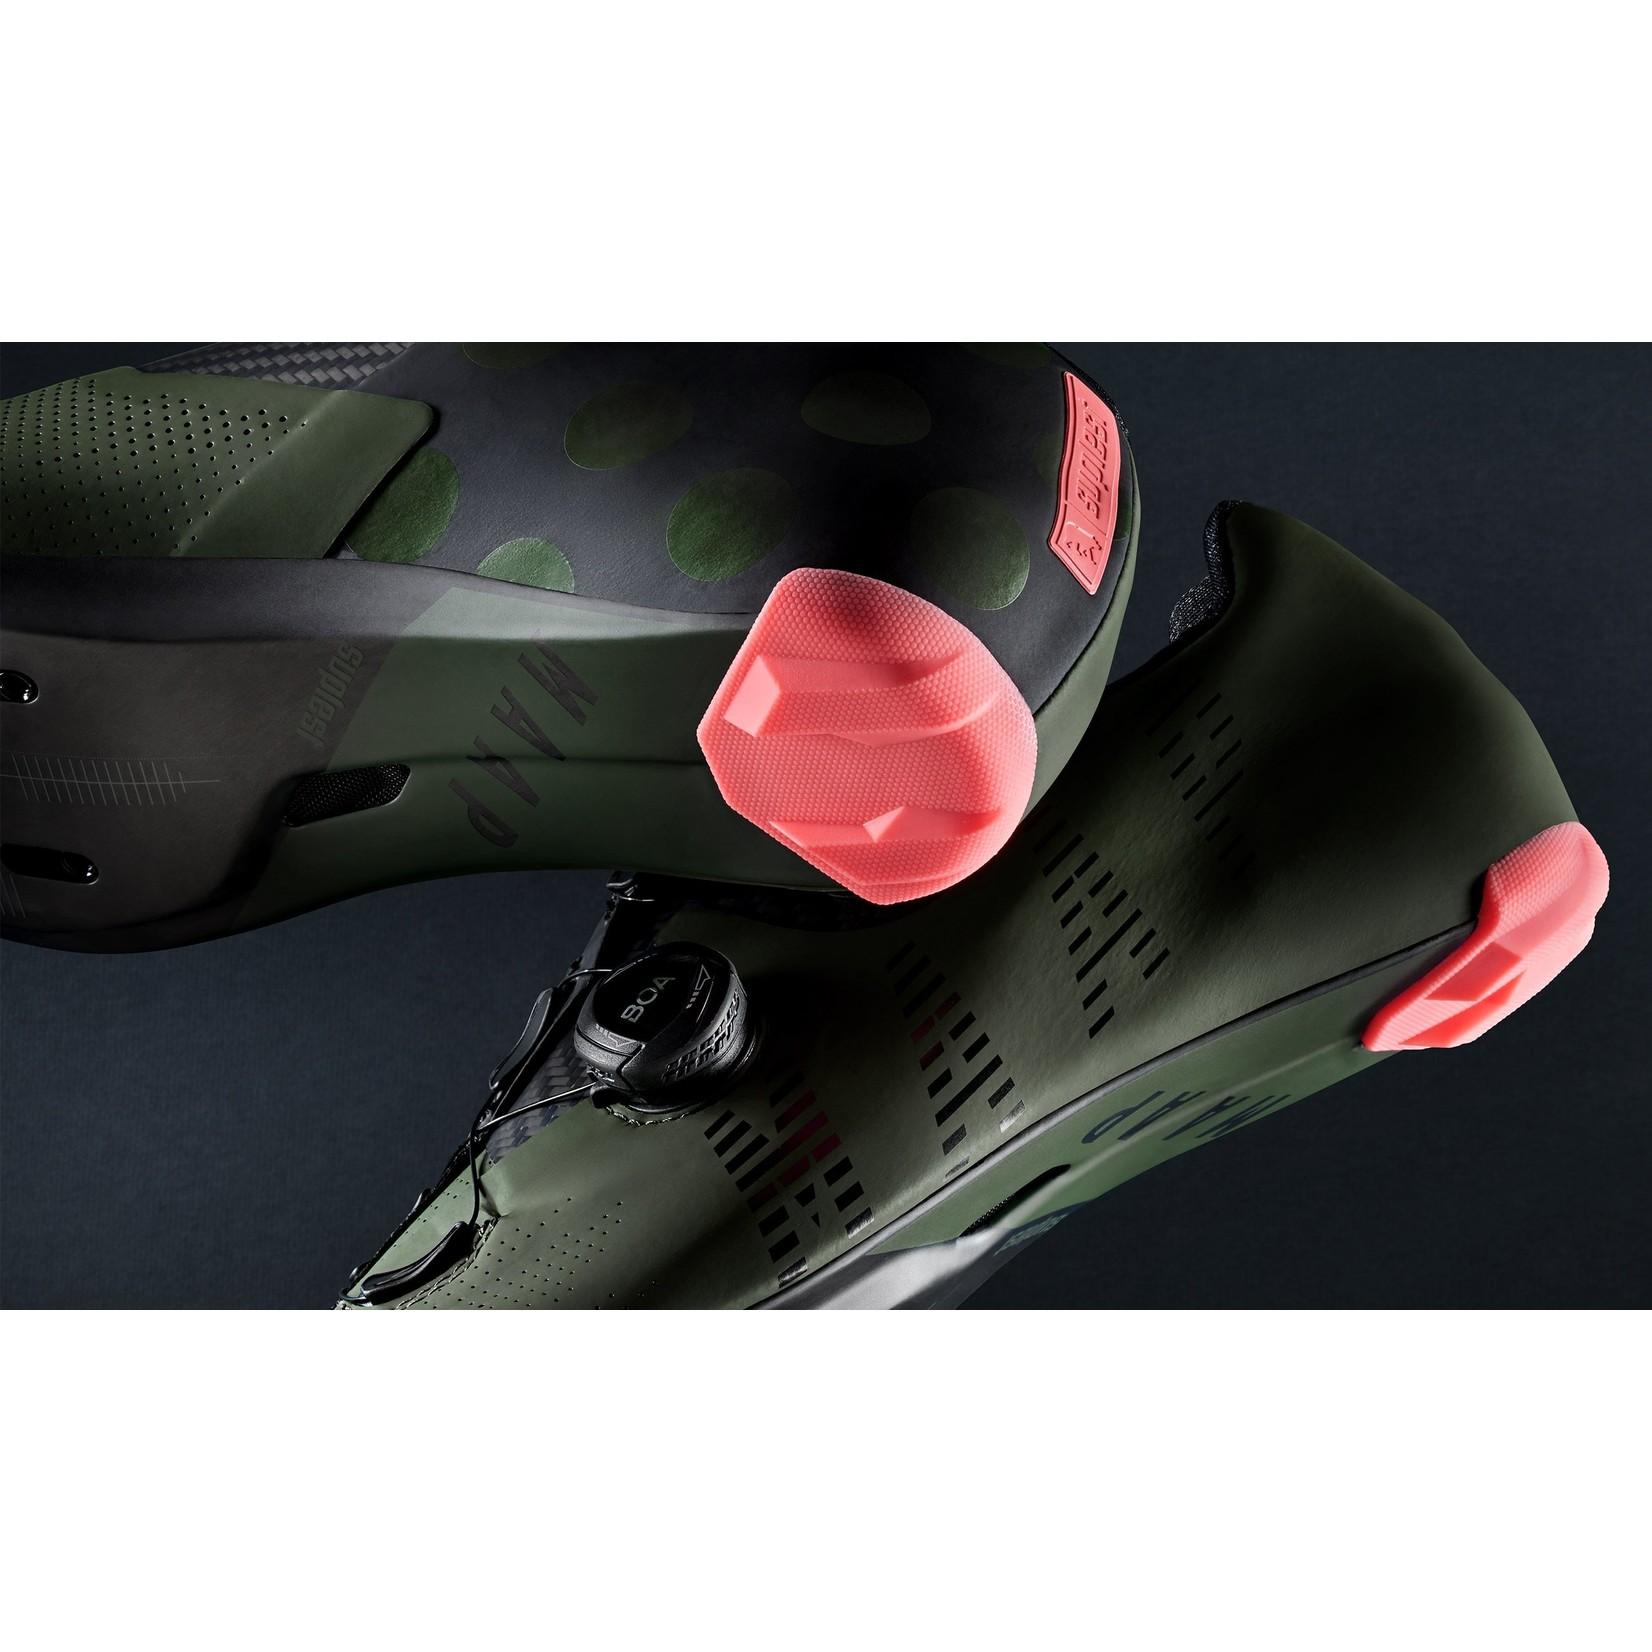 Maap MAAP x Suplest Edge+ Road Pro Shoe - Army Green